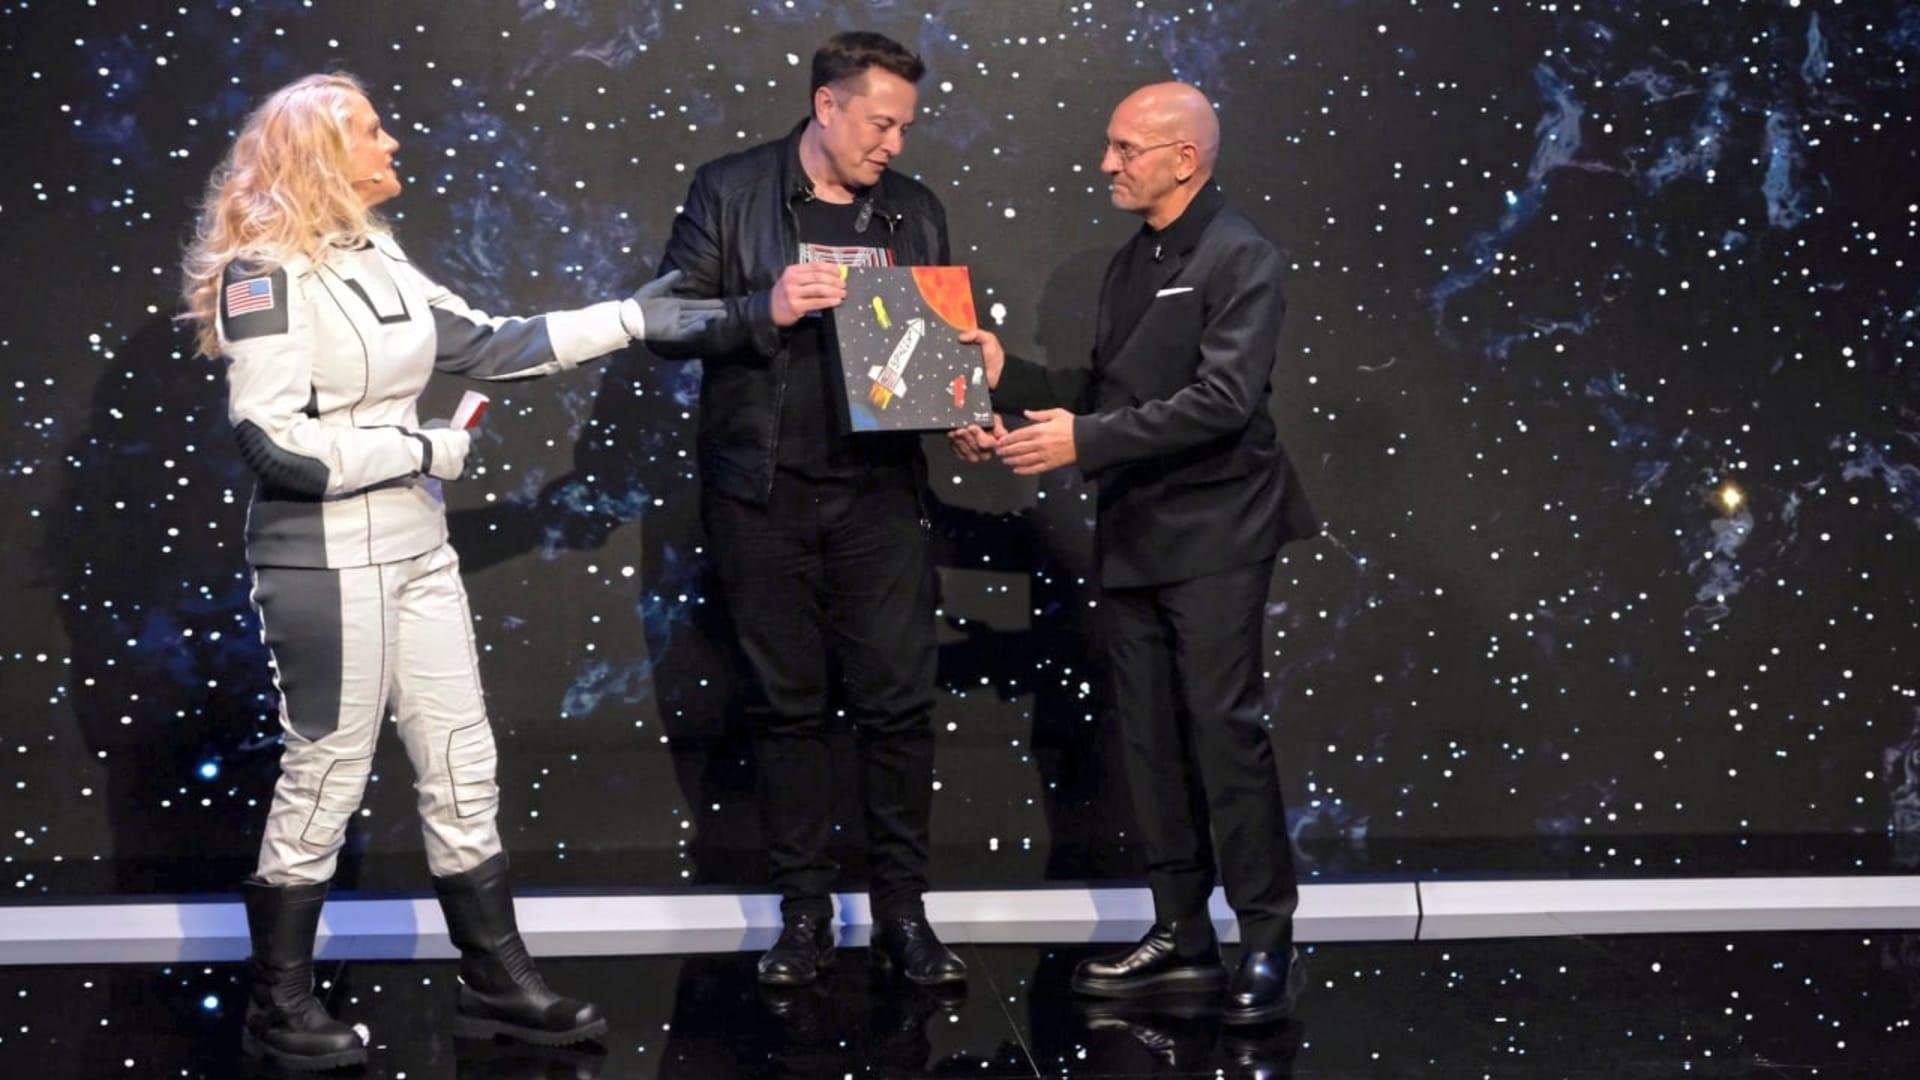 Sven Vath & Elon Musk